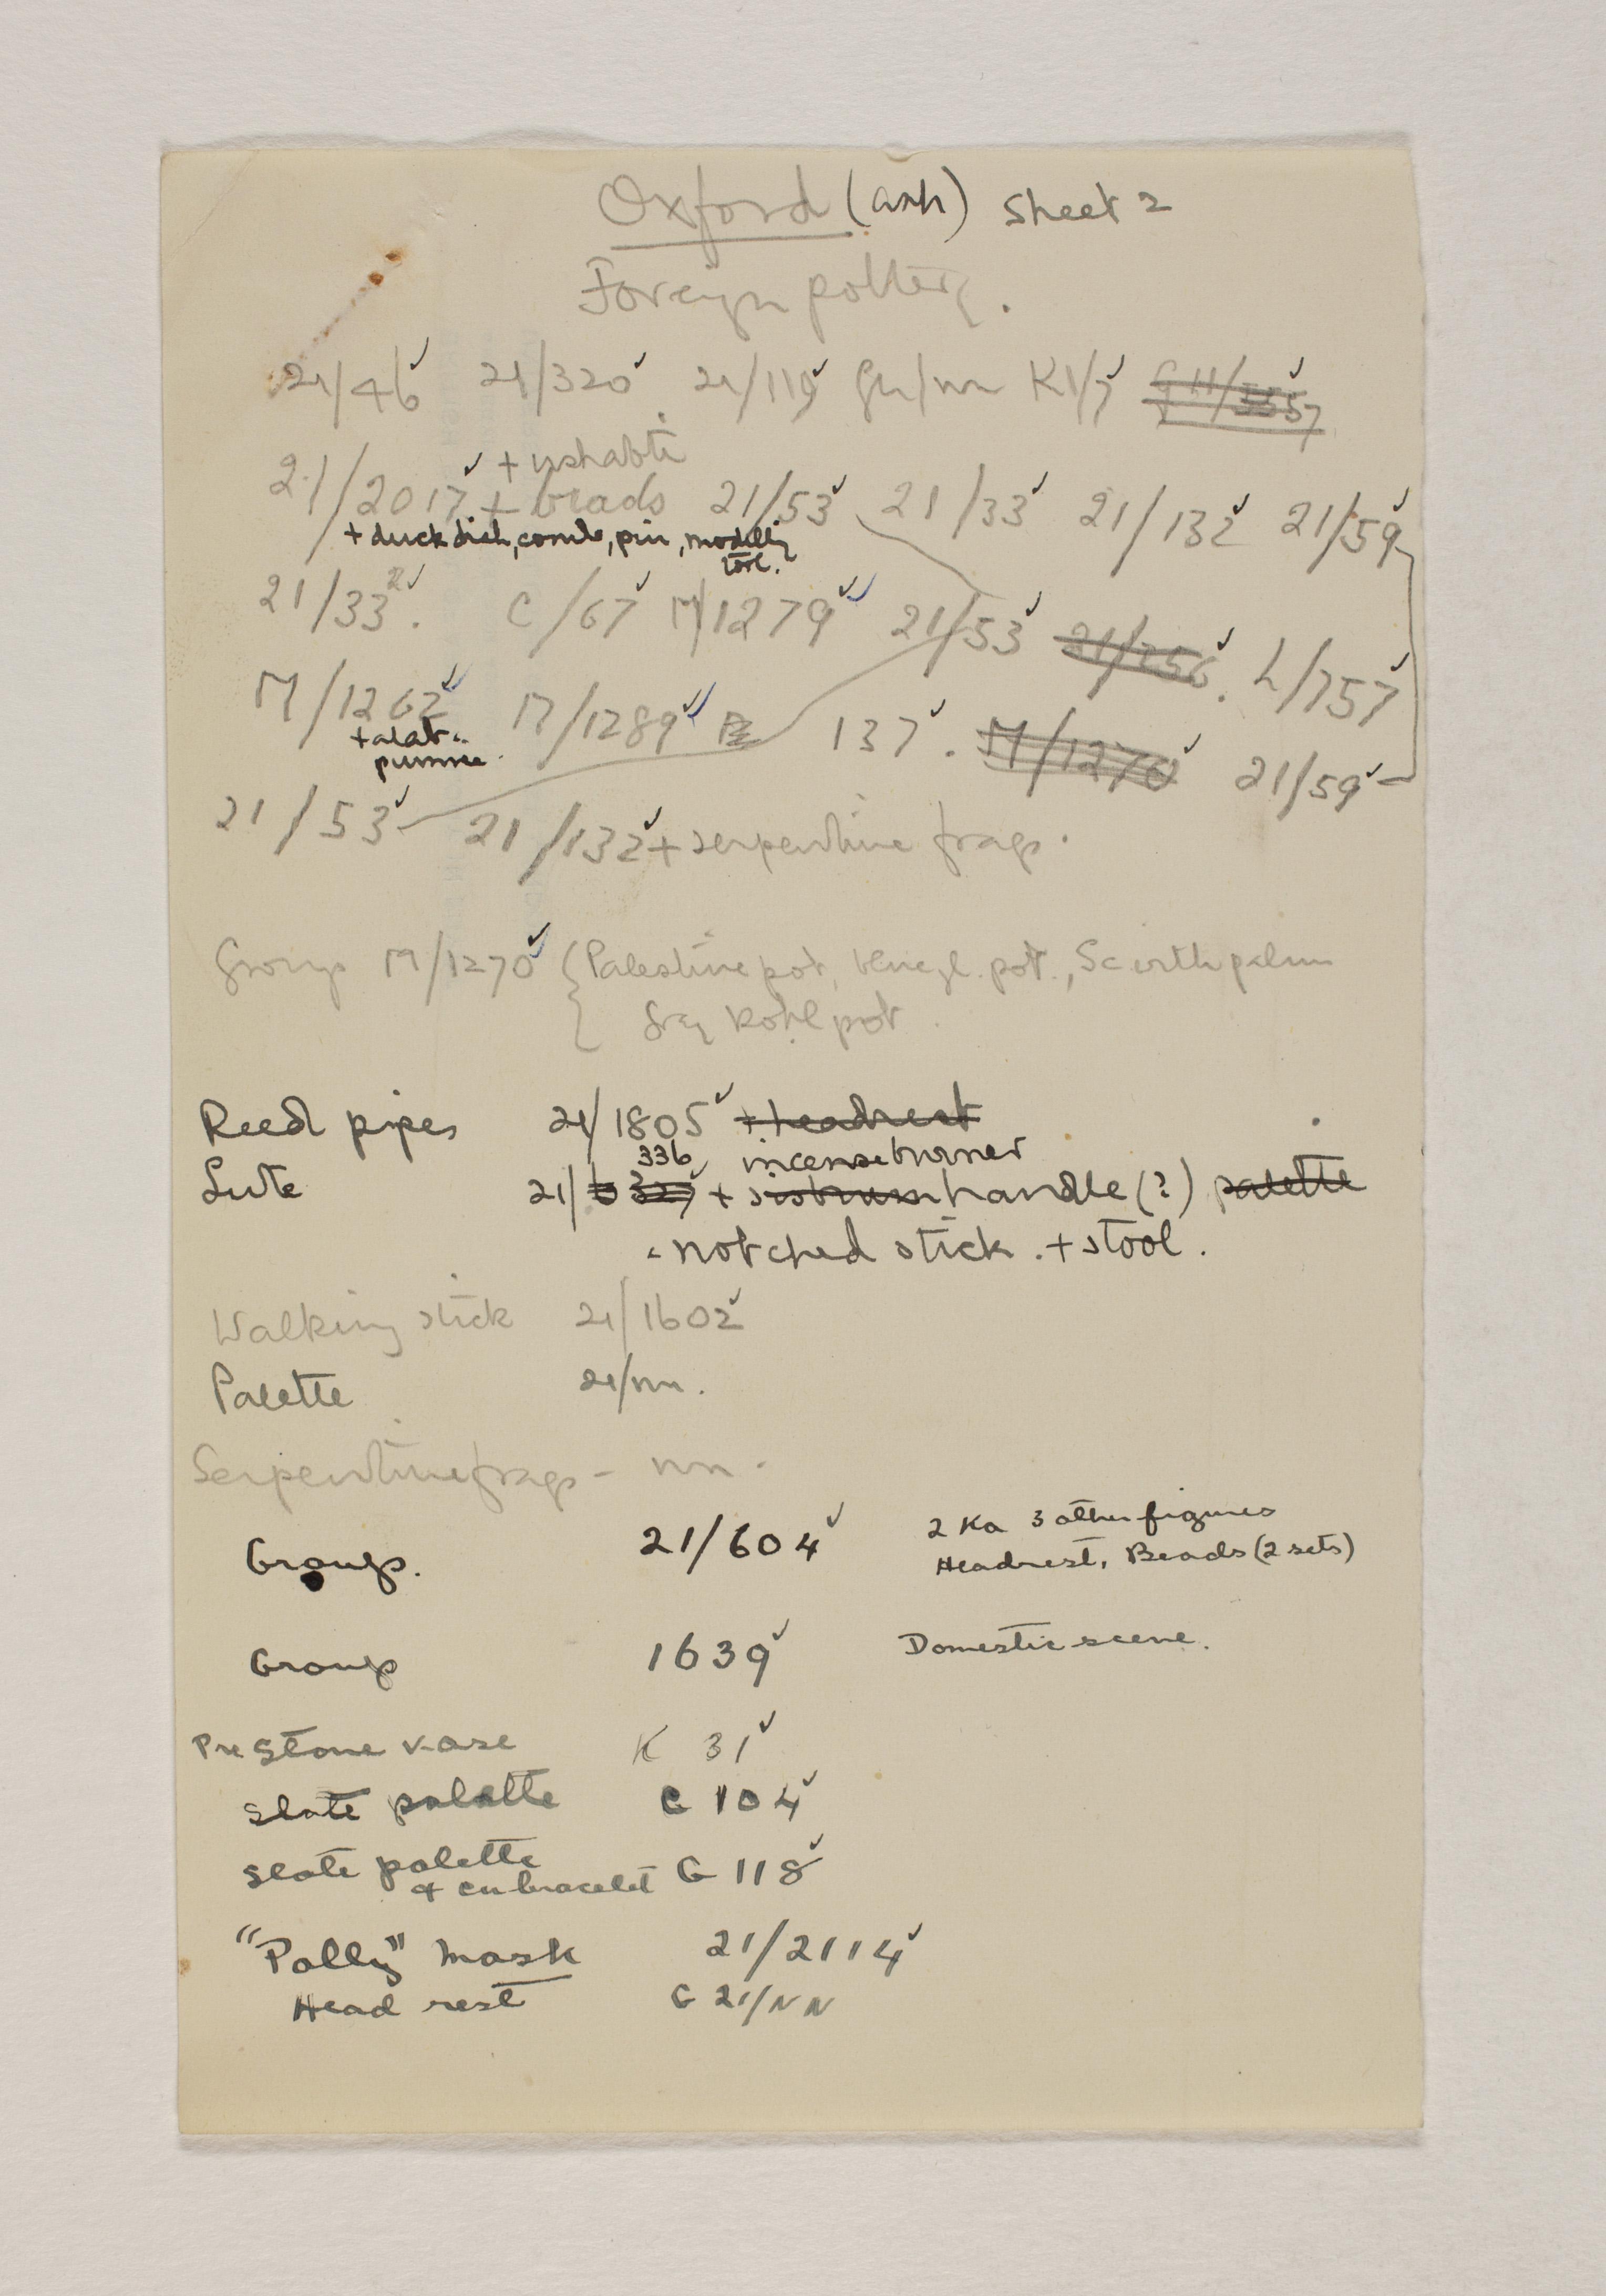 1919-21 Sedment, Lahun Individual institution list PMA/WFP1/D/24/37.2